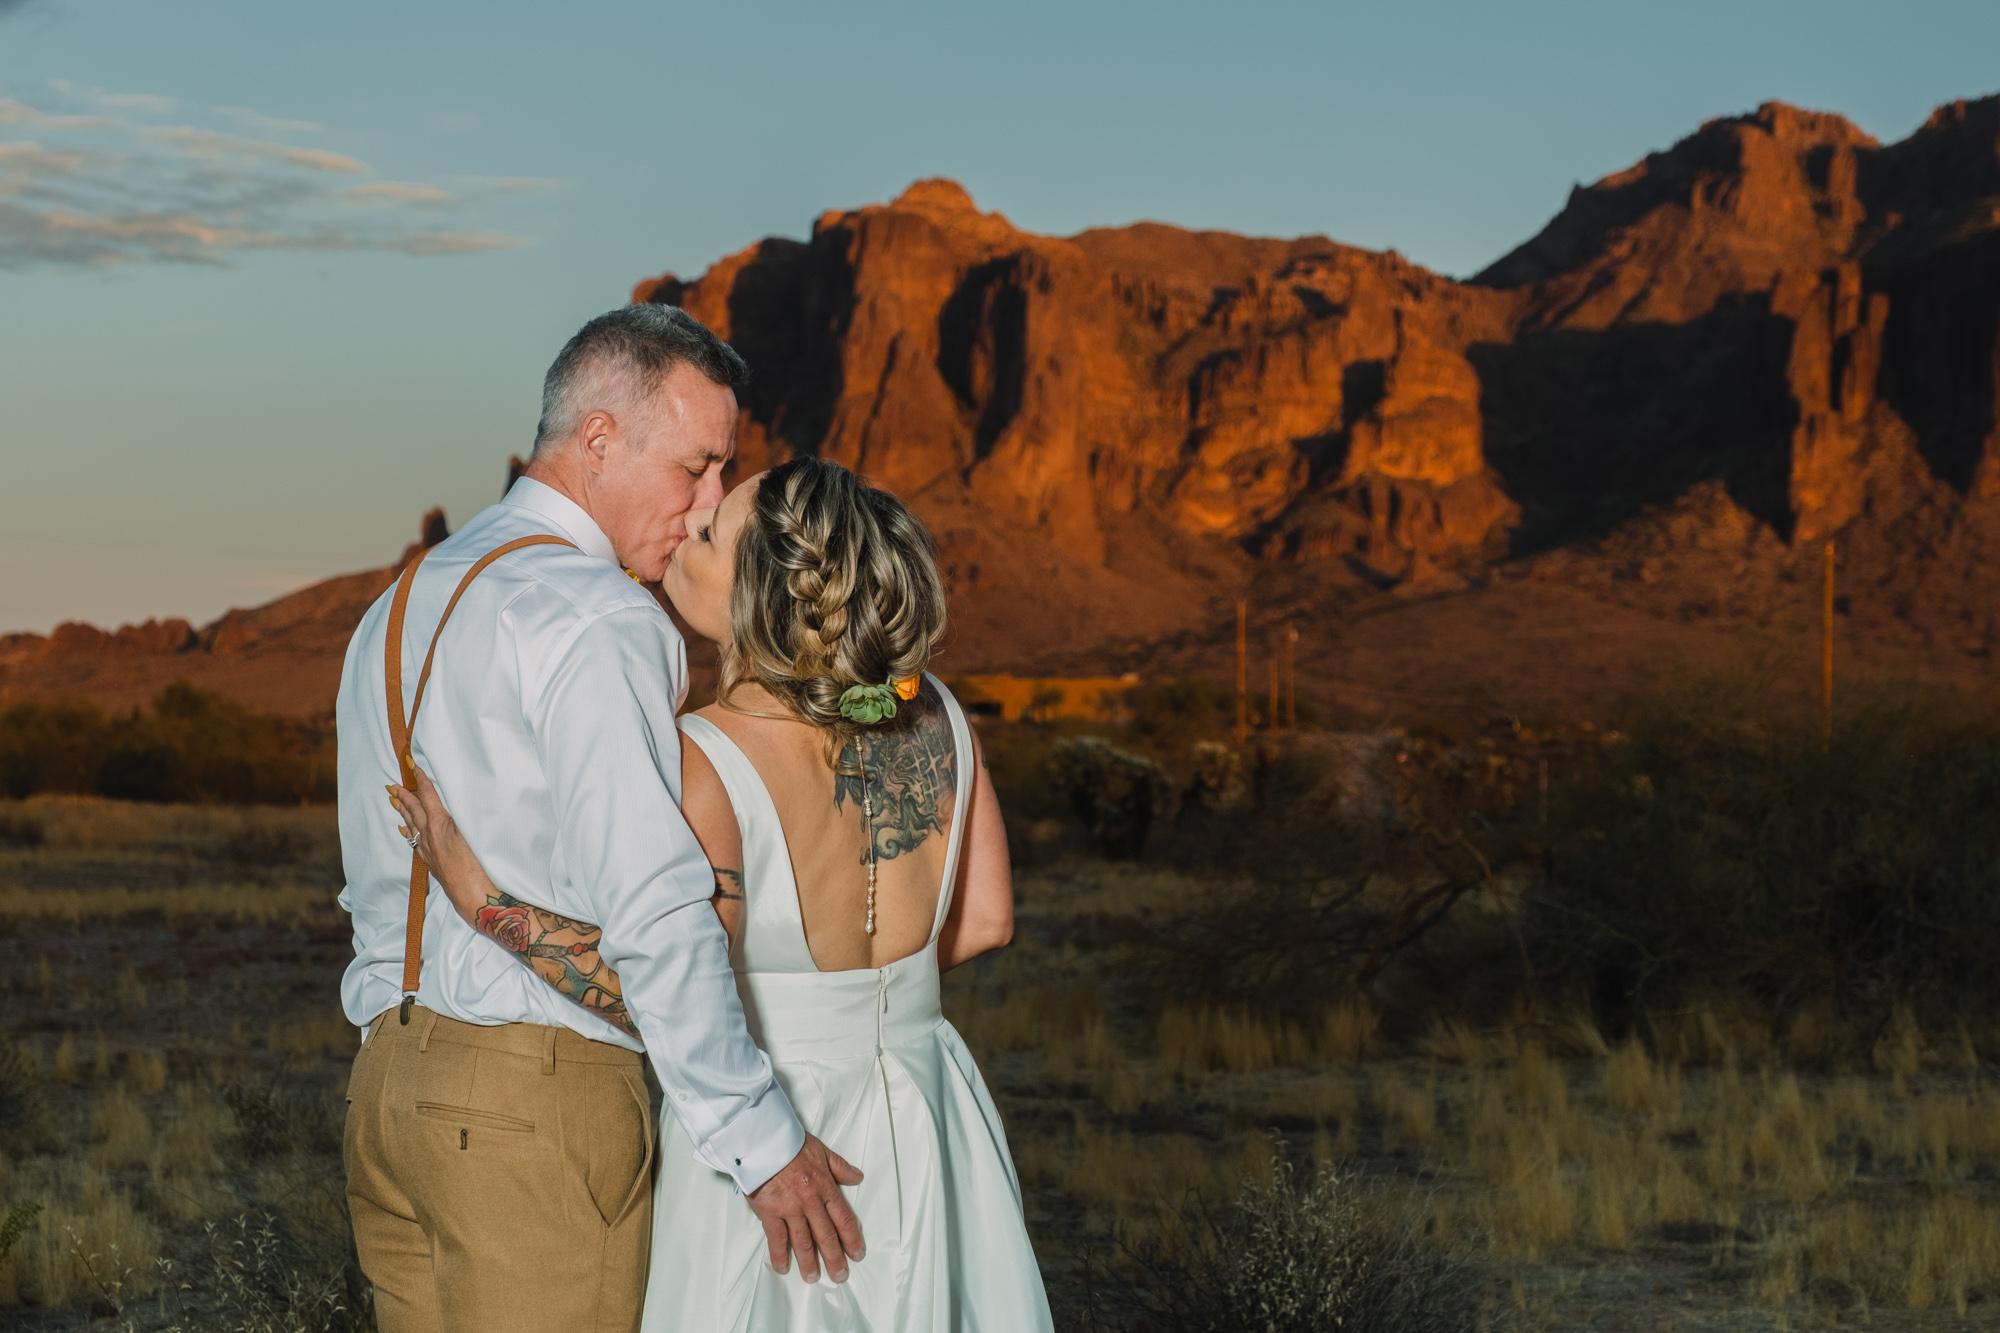 Brandy + Toby | Outdoor Arizona Wedding at The Paseo by Cyndi